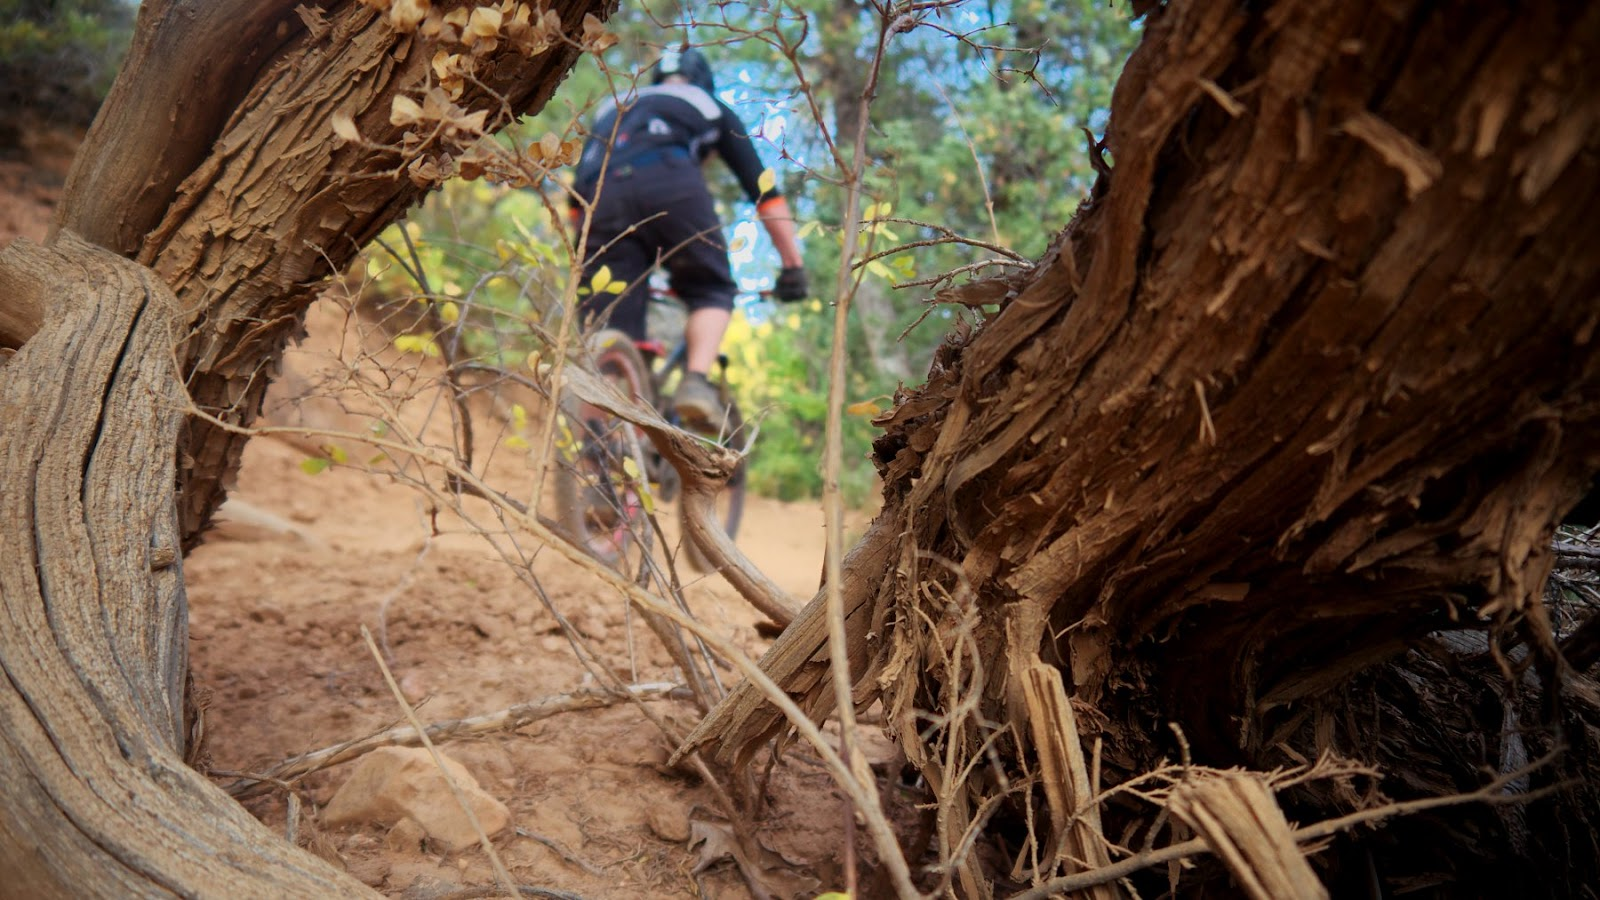 wardsworth creek trail.jpg